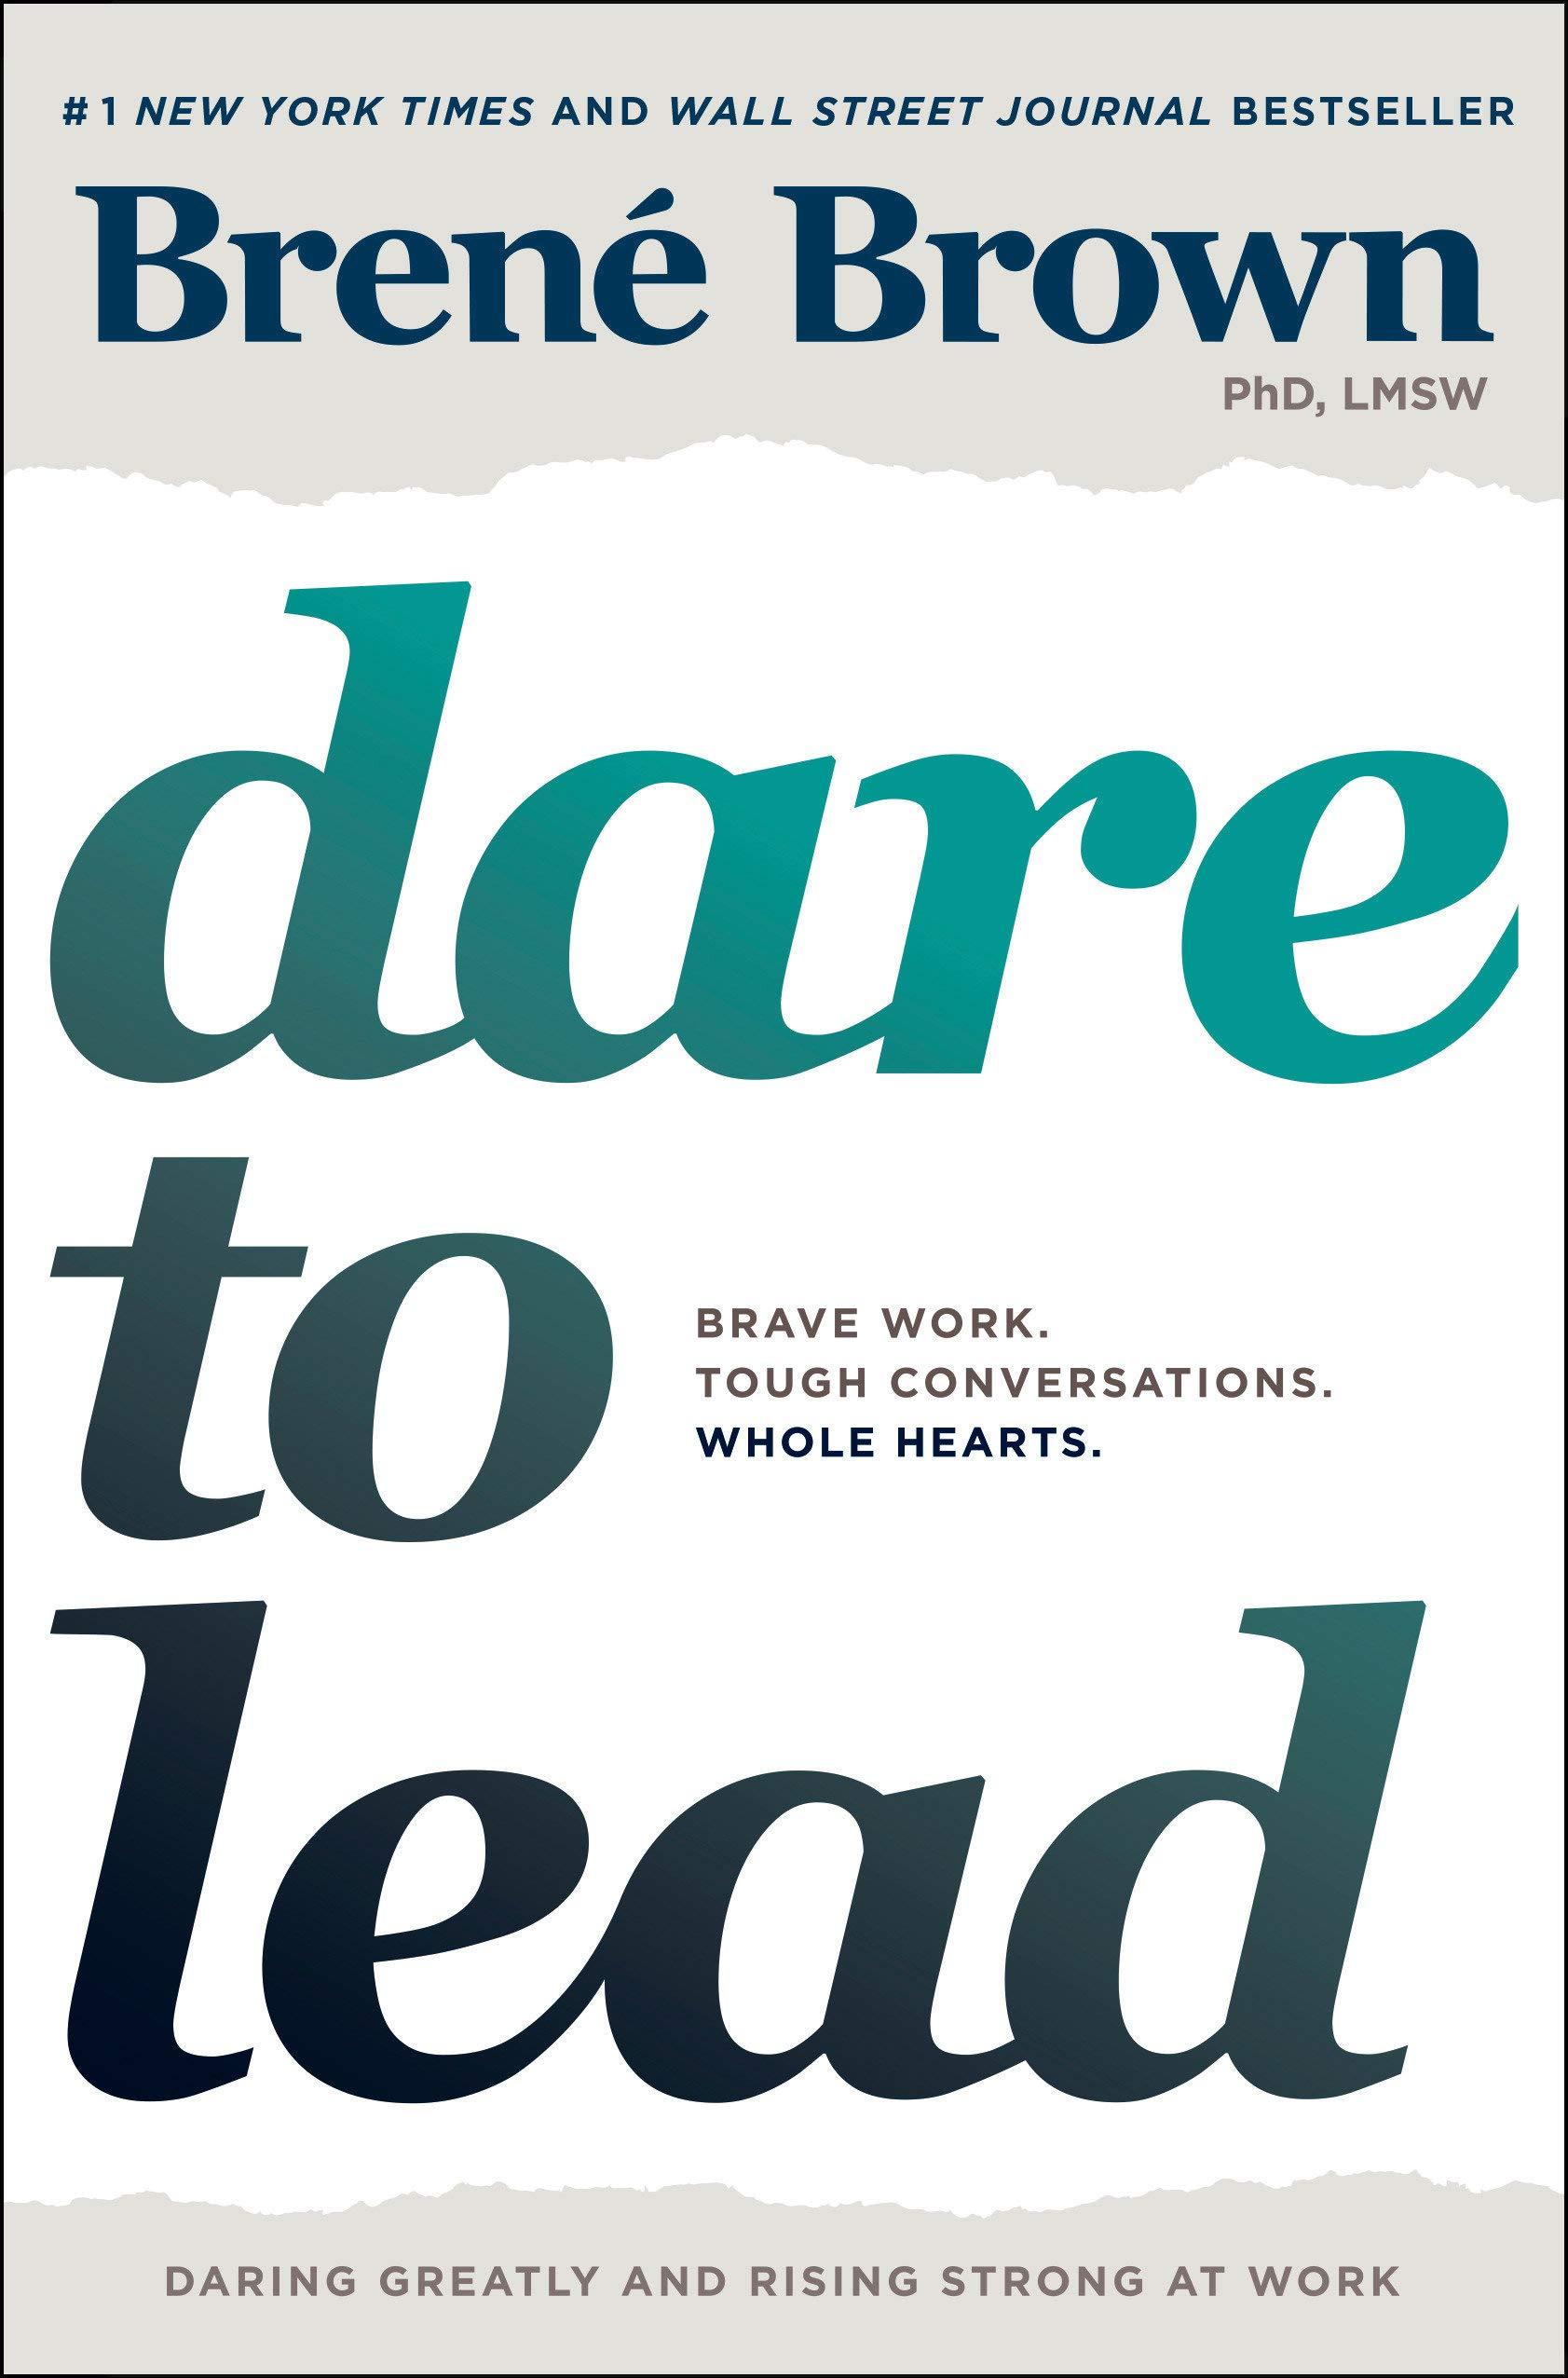 dare-to-lead-brene-brown-theme.jpg